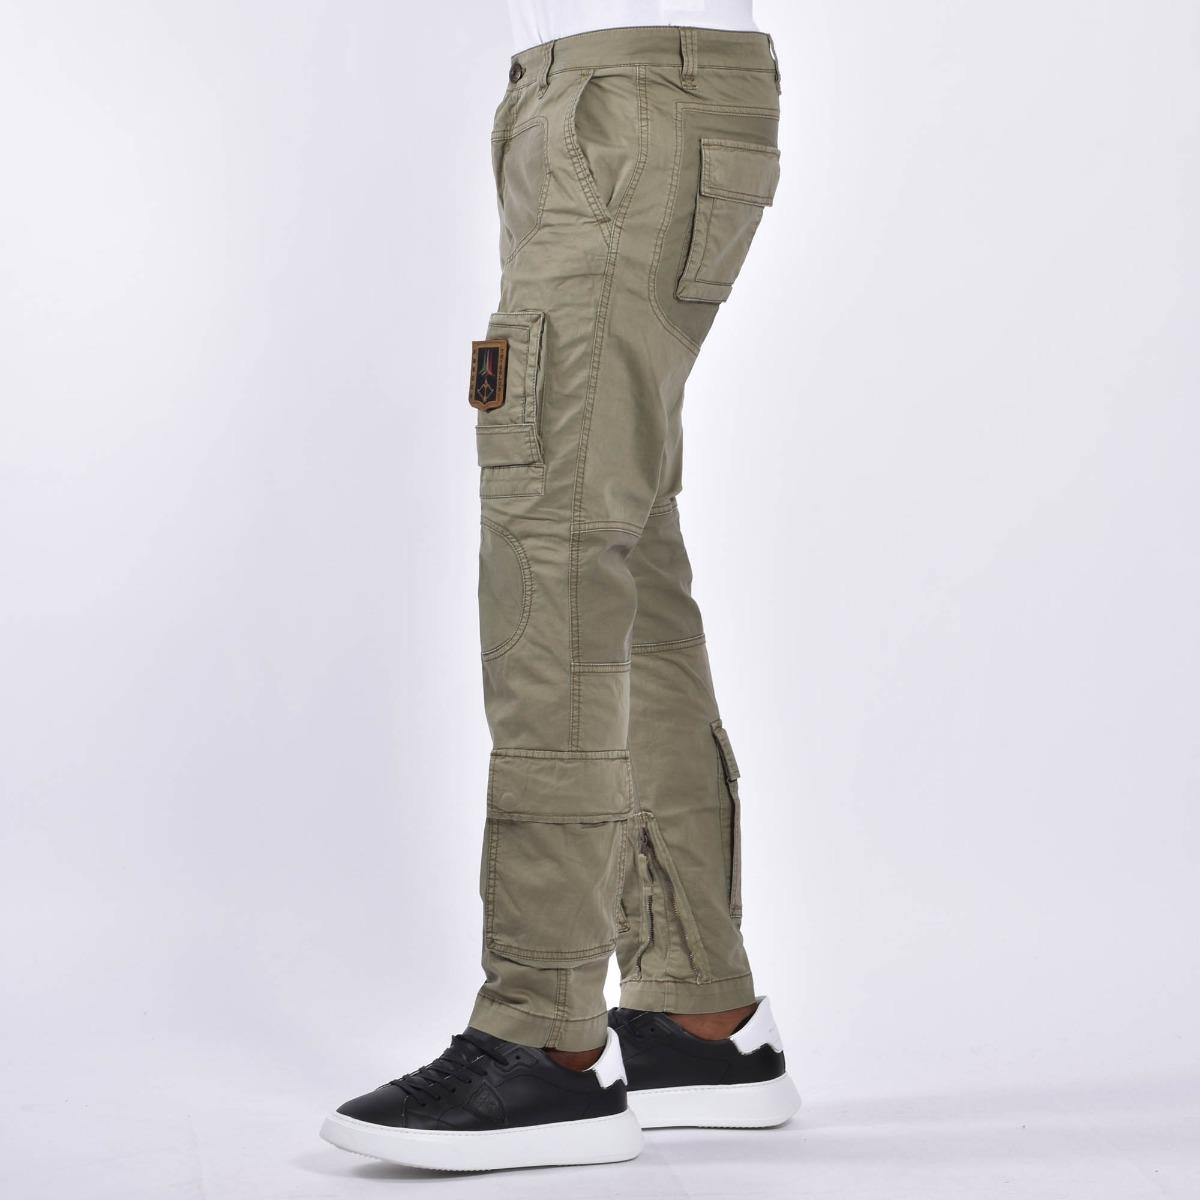 Pantalone anti-g tasconi - Verde